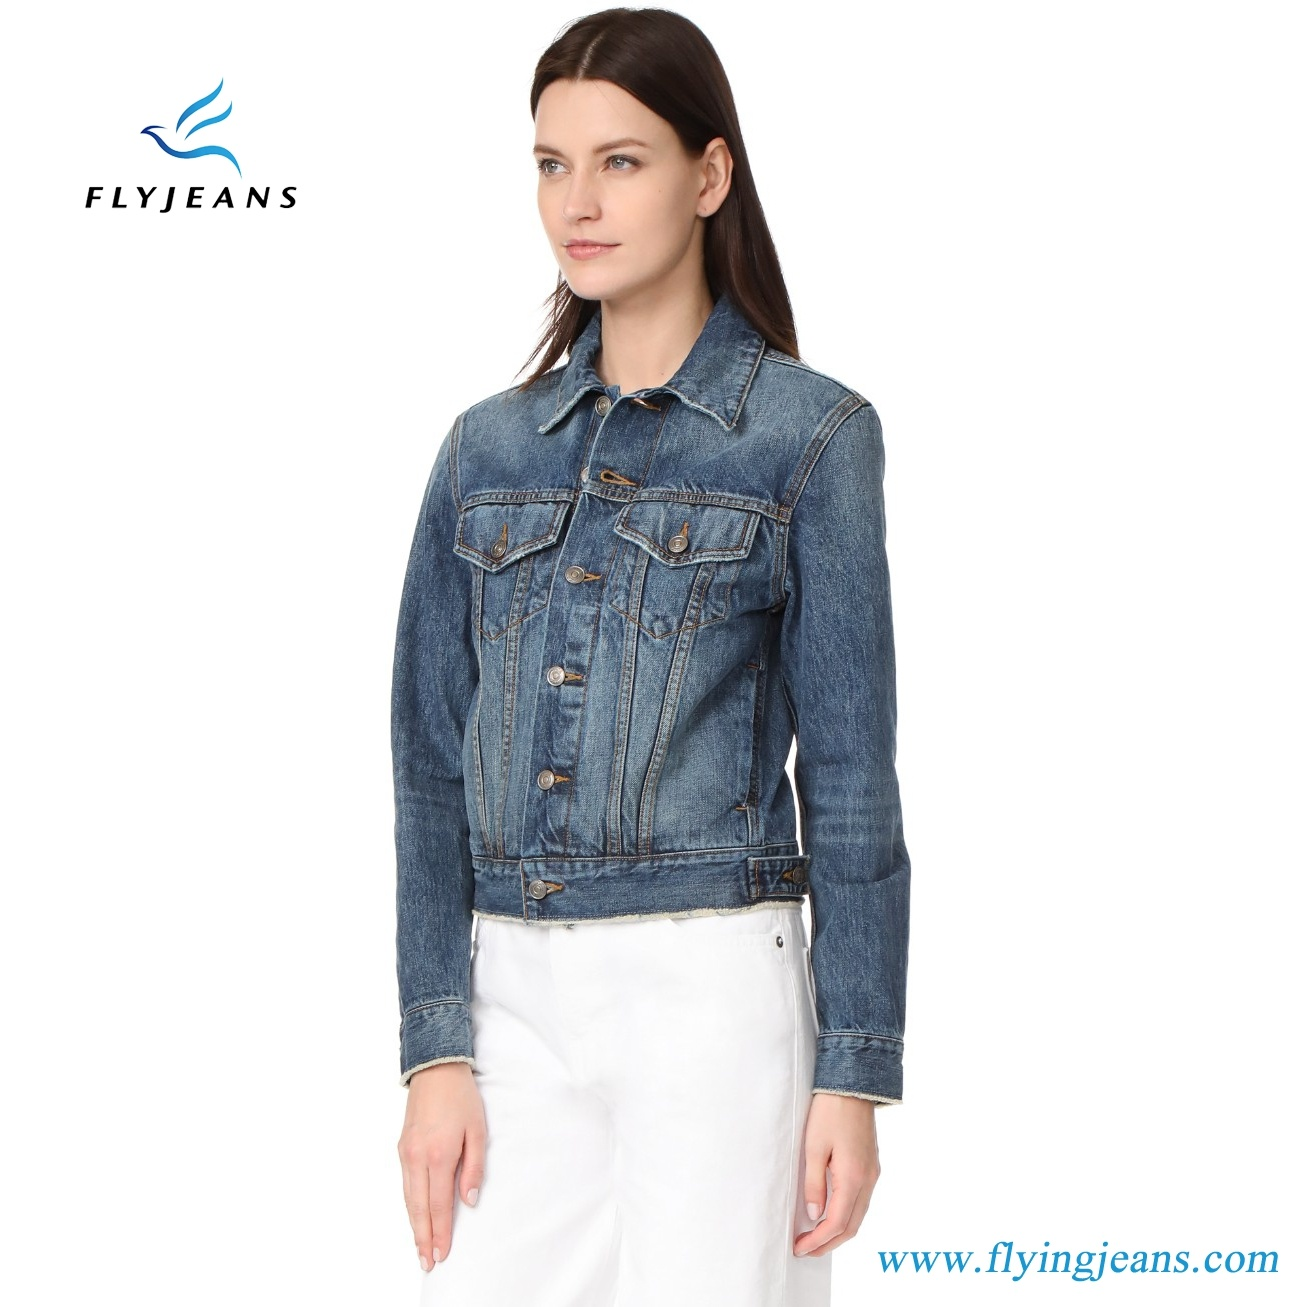 Women Clothes Fashion Classic Casual Ladies Denim Jeans Jacket